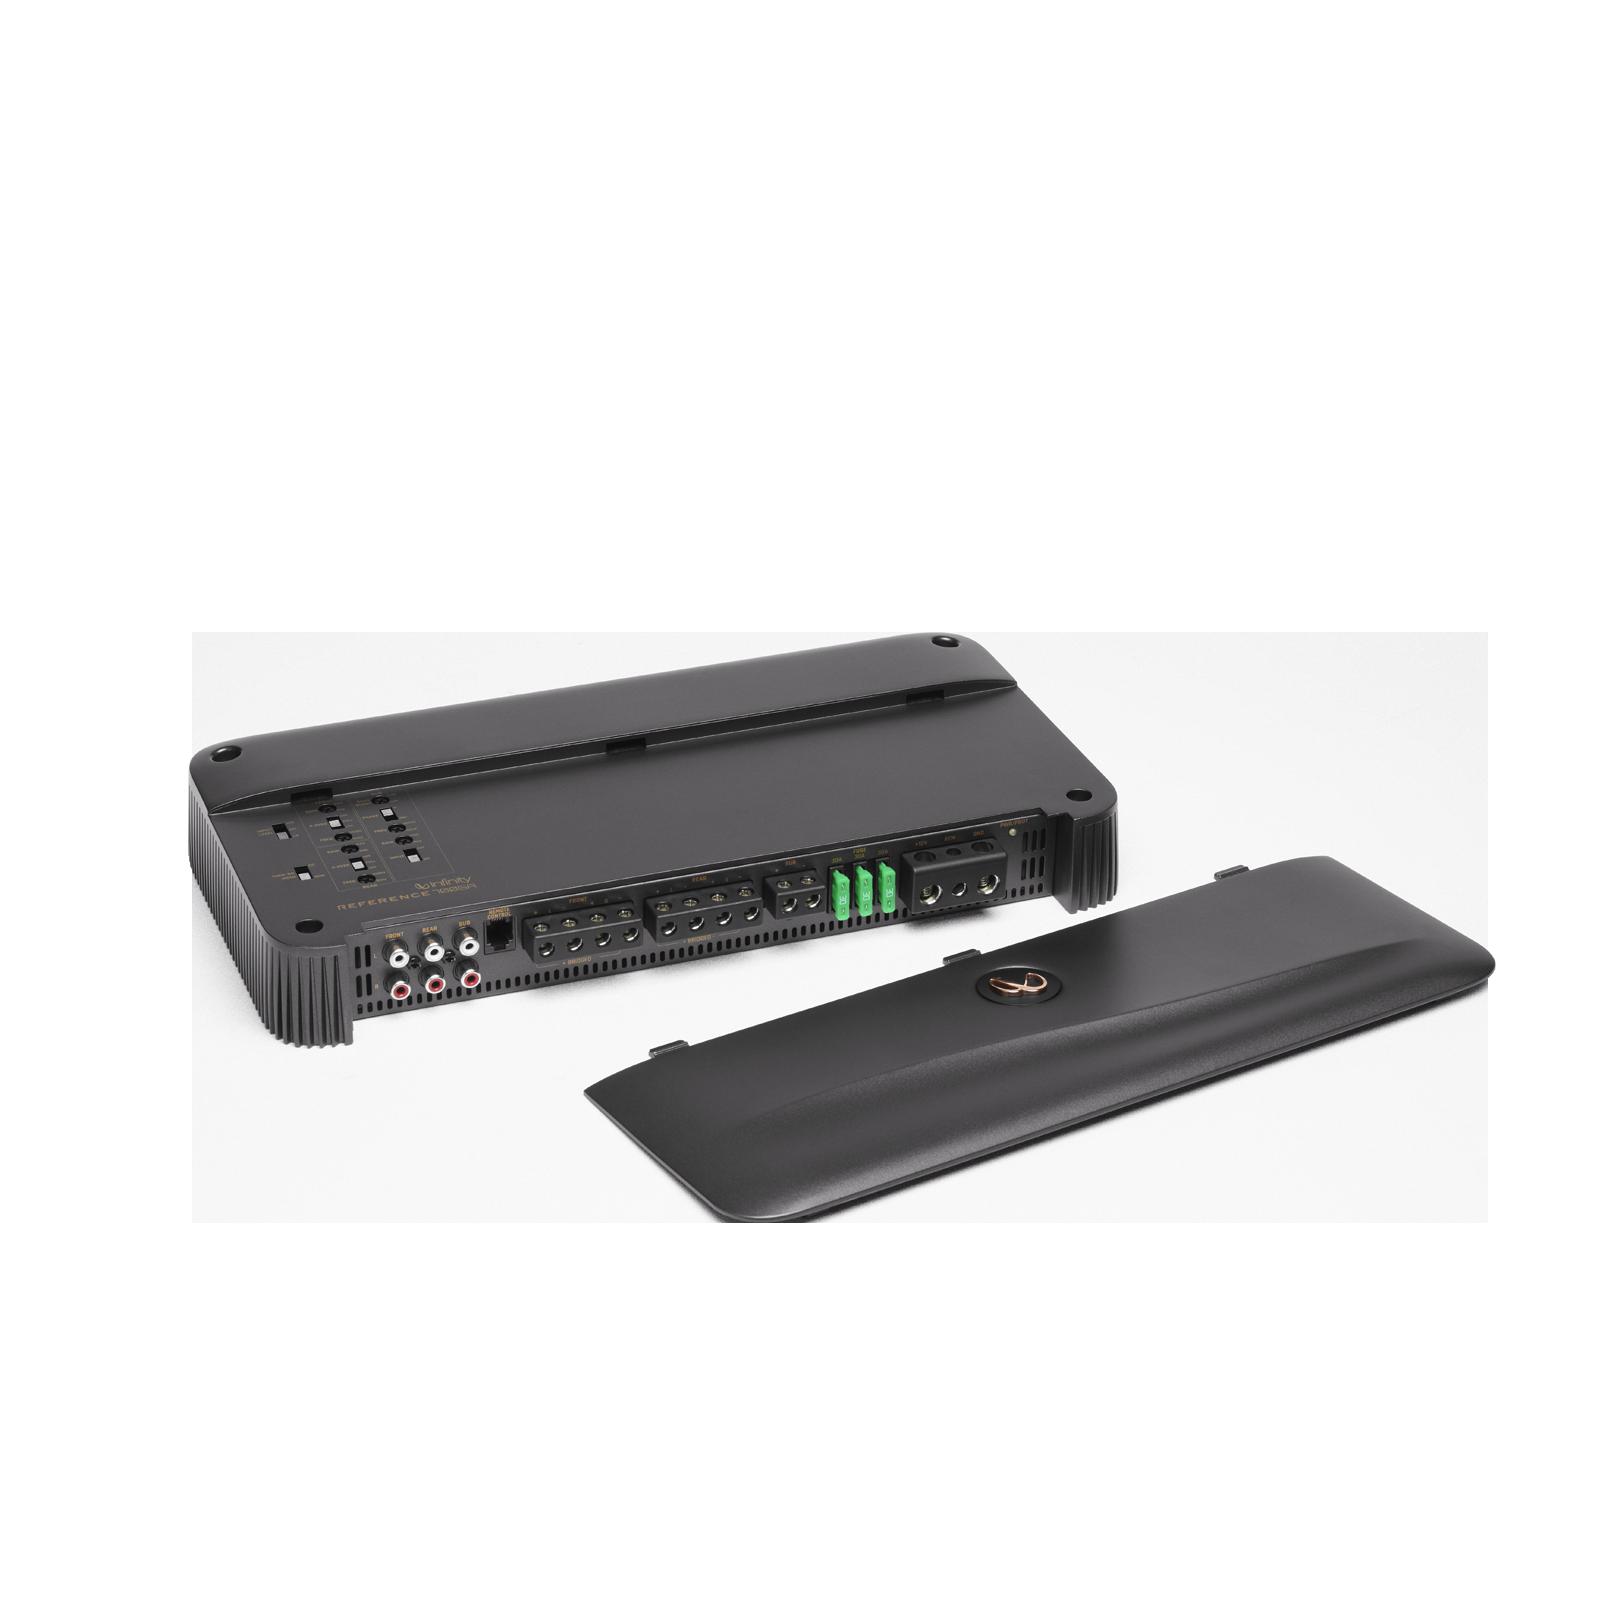 Reference 7005A - Black - High performance 5 channel car amplifier - Detailshot 2